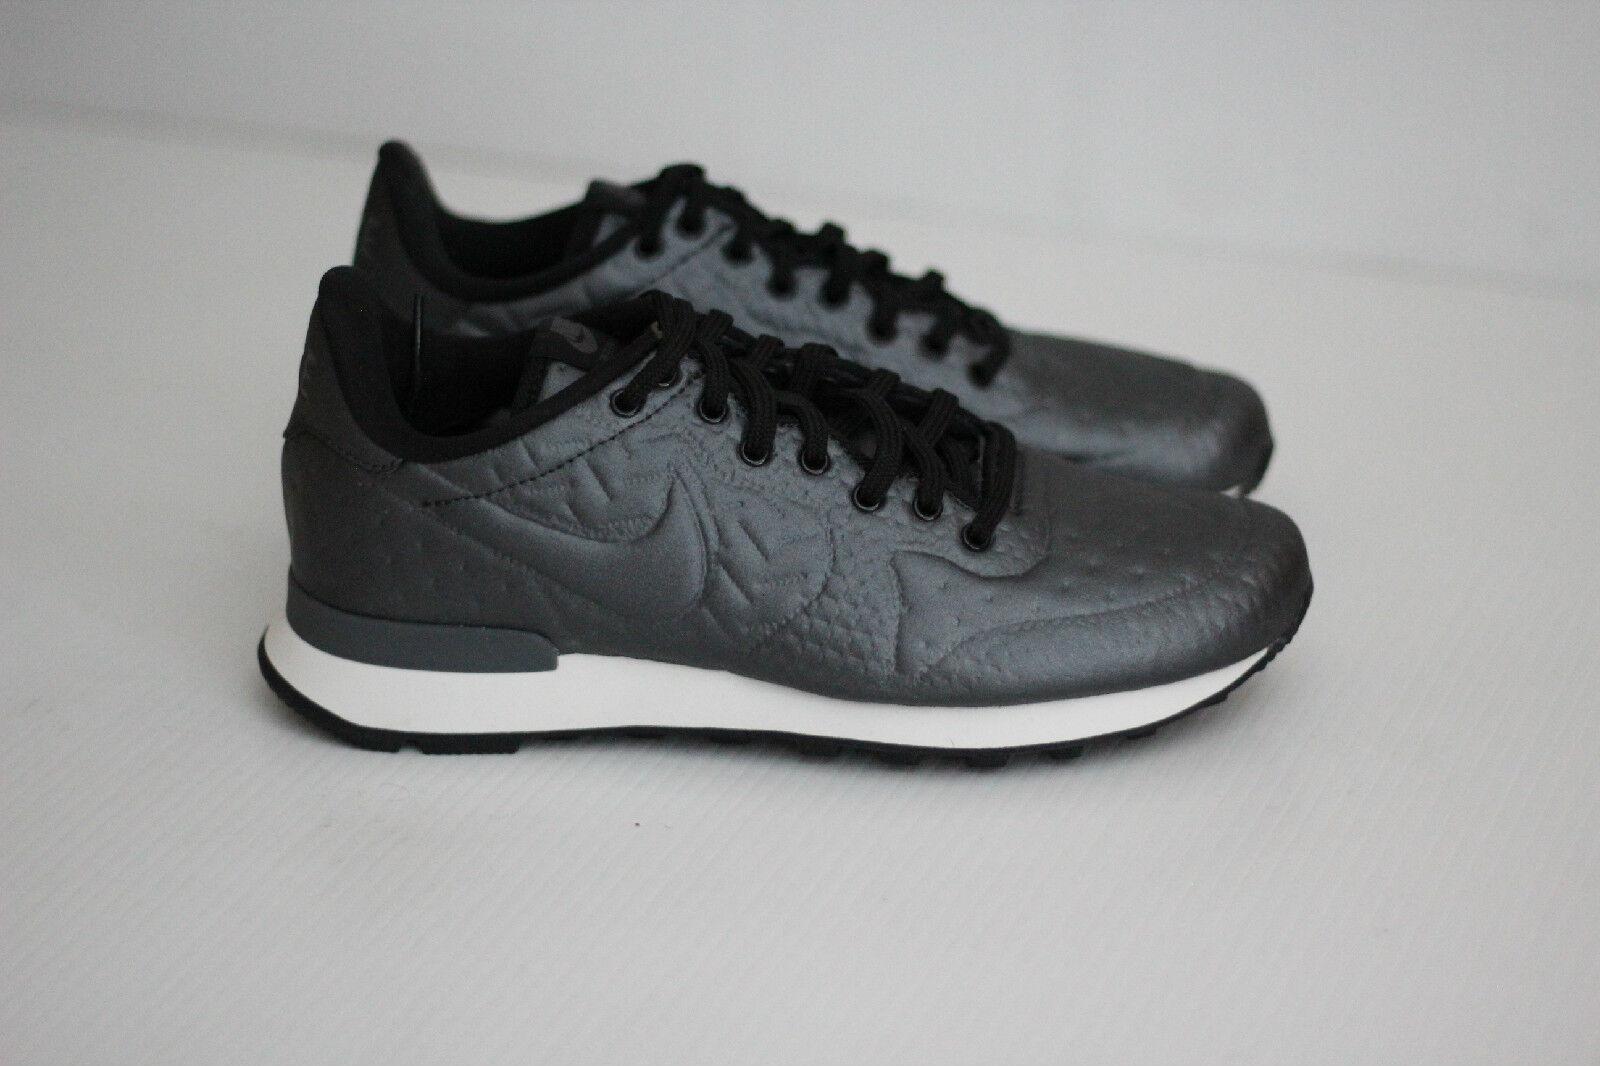 Nike Women Internationalist Jacquard Winter Sneaker - Metallic Dark Grey - 8.5US